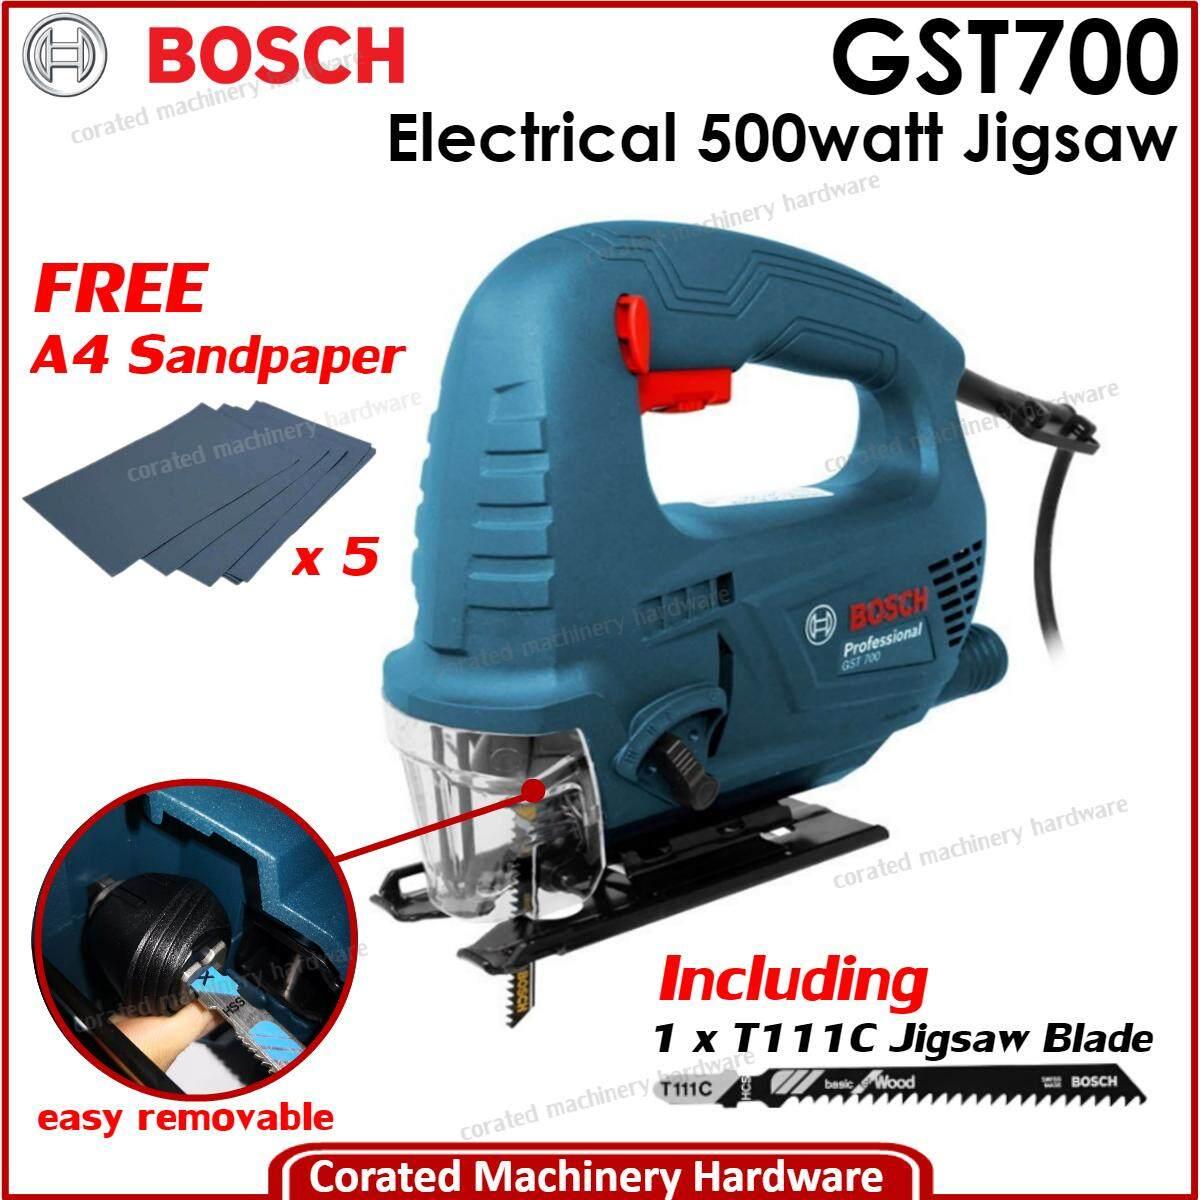 [corated] Bosch Gst 700 Jigsaw 500 Watt (6 Months Warranty) Gst700 By Corated Enterprises (m) Sdn Bhd.